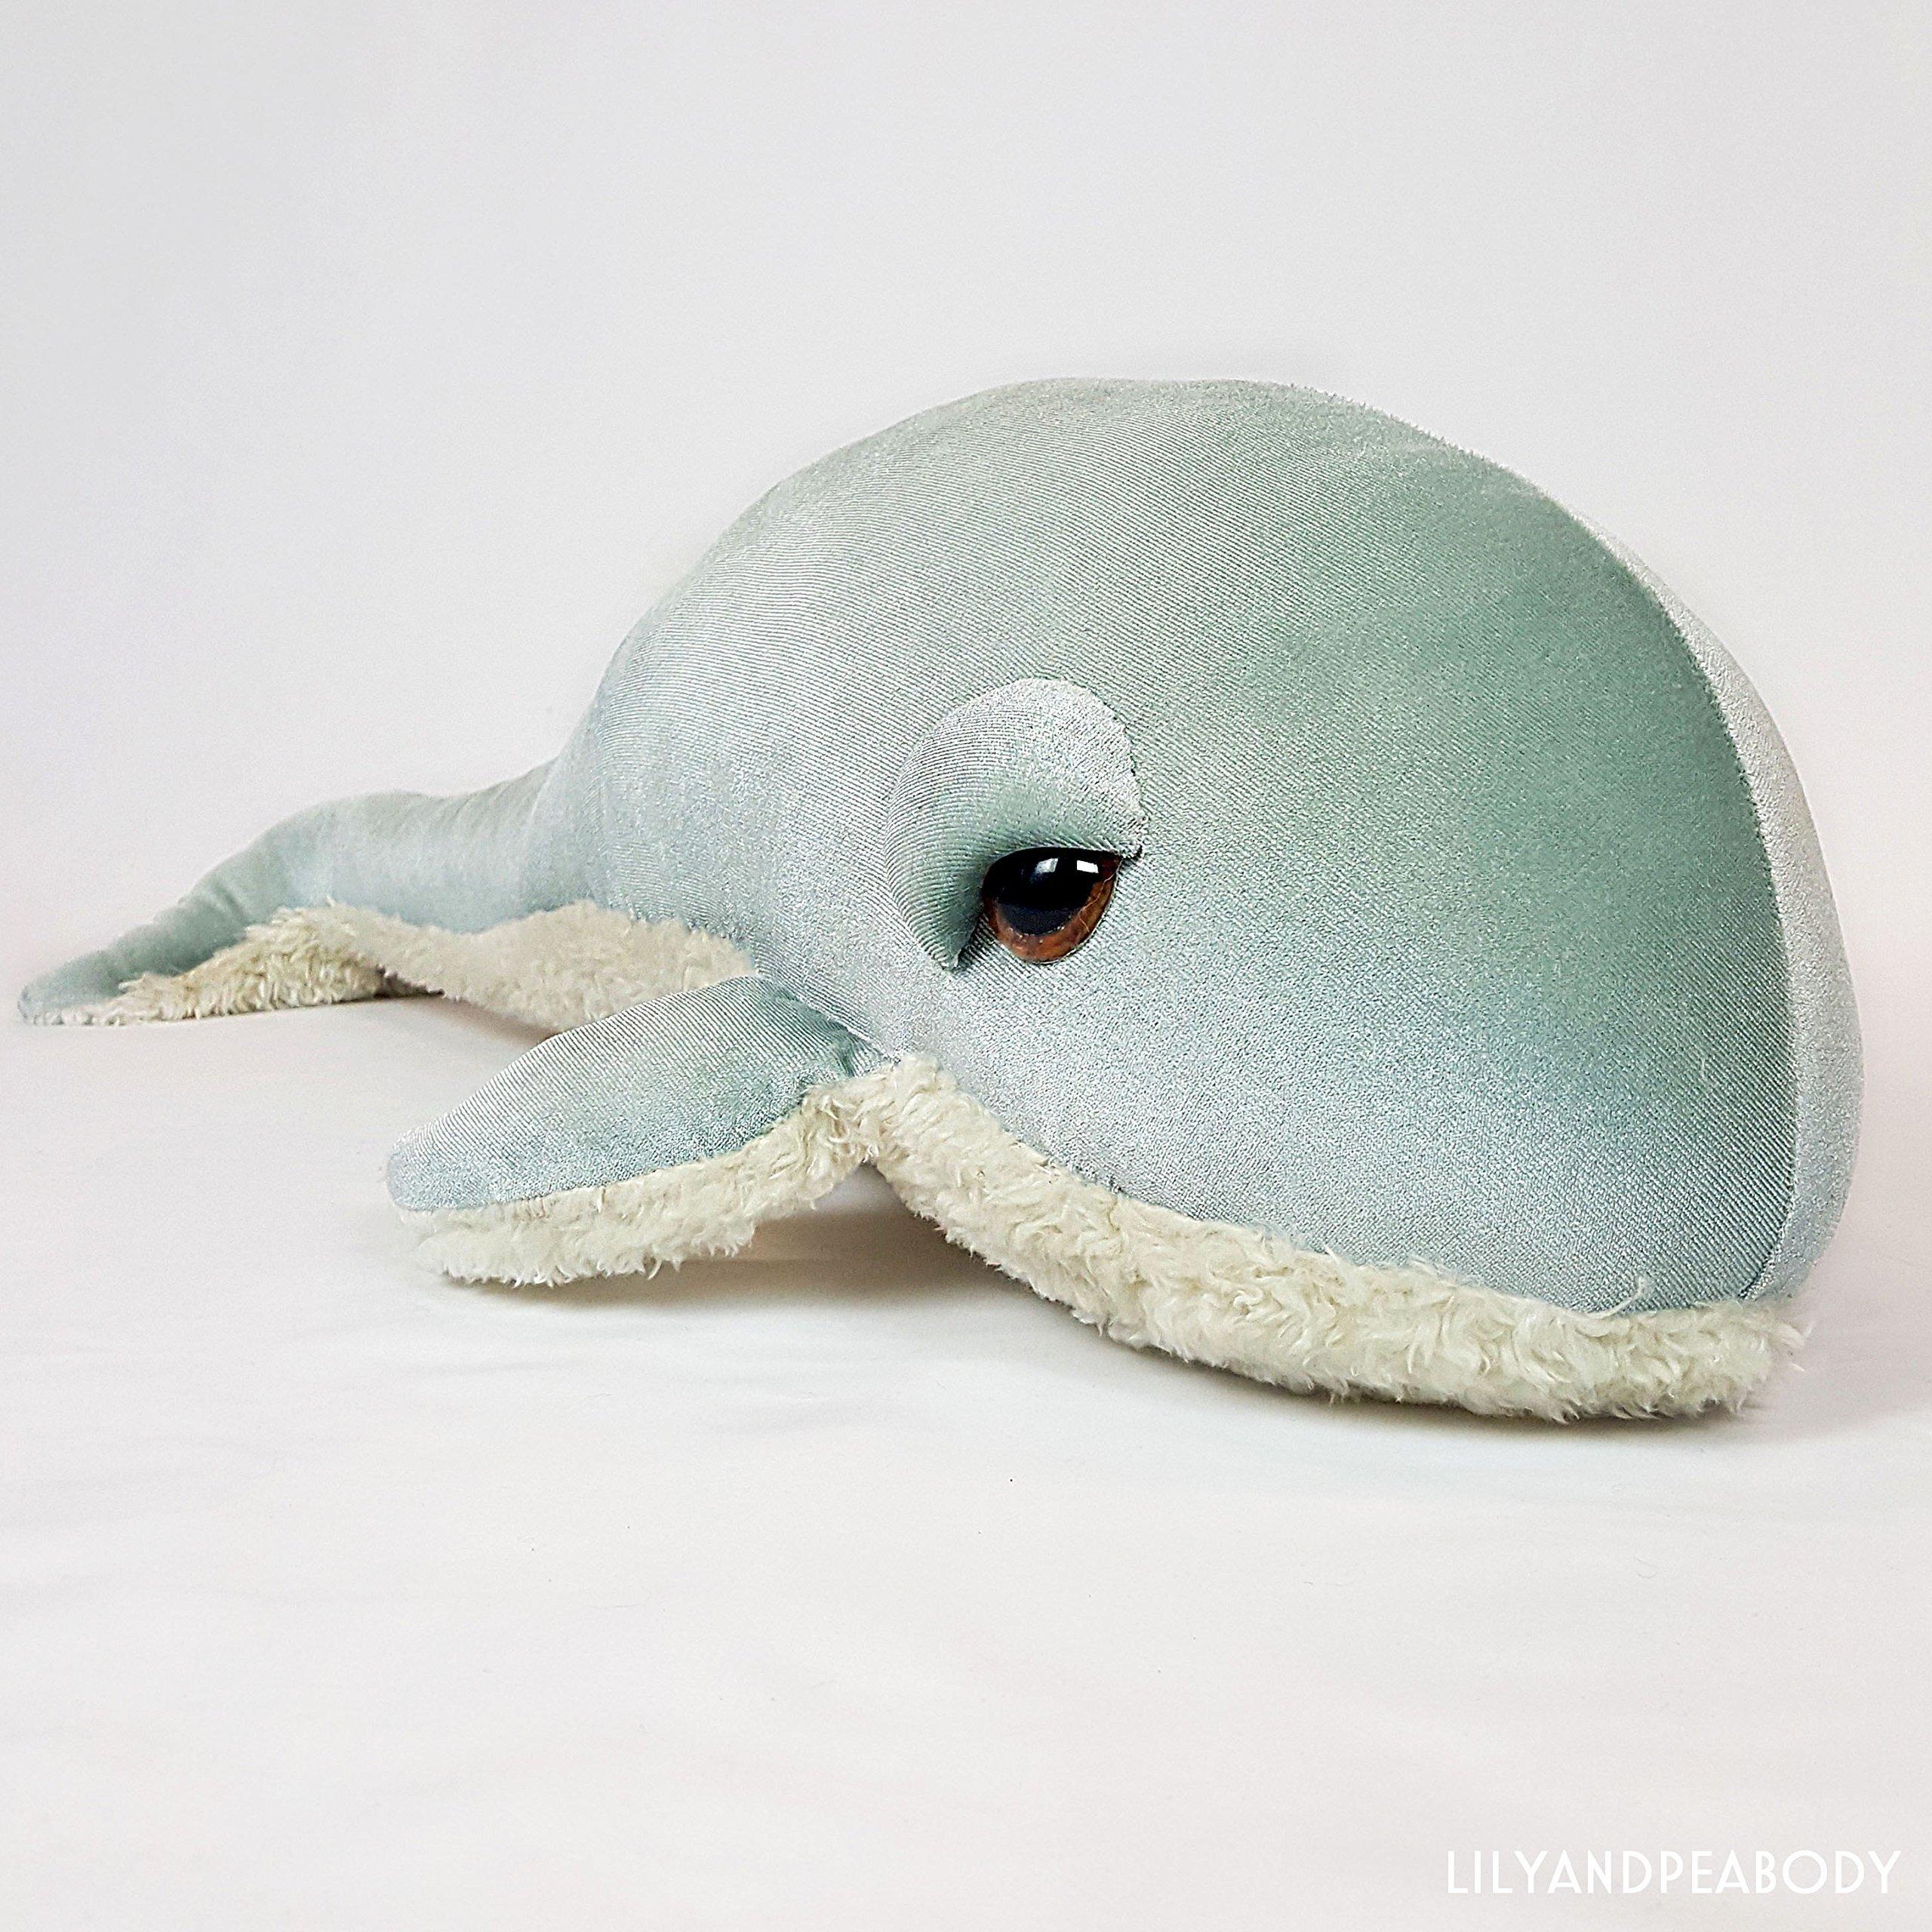 Whale Plush Stuffed Animal, Sea Creature Stuffed Animal, Ocean Life Soft Sculpture, Blue Whale Nursery Decor, Nautical Marine Animal